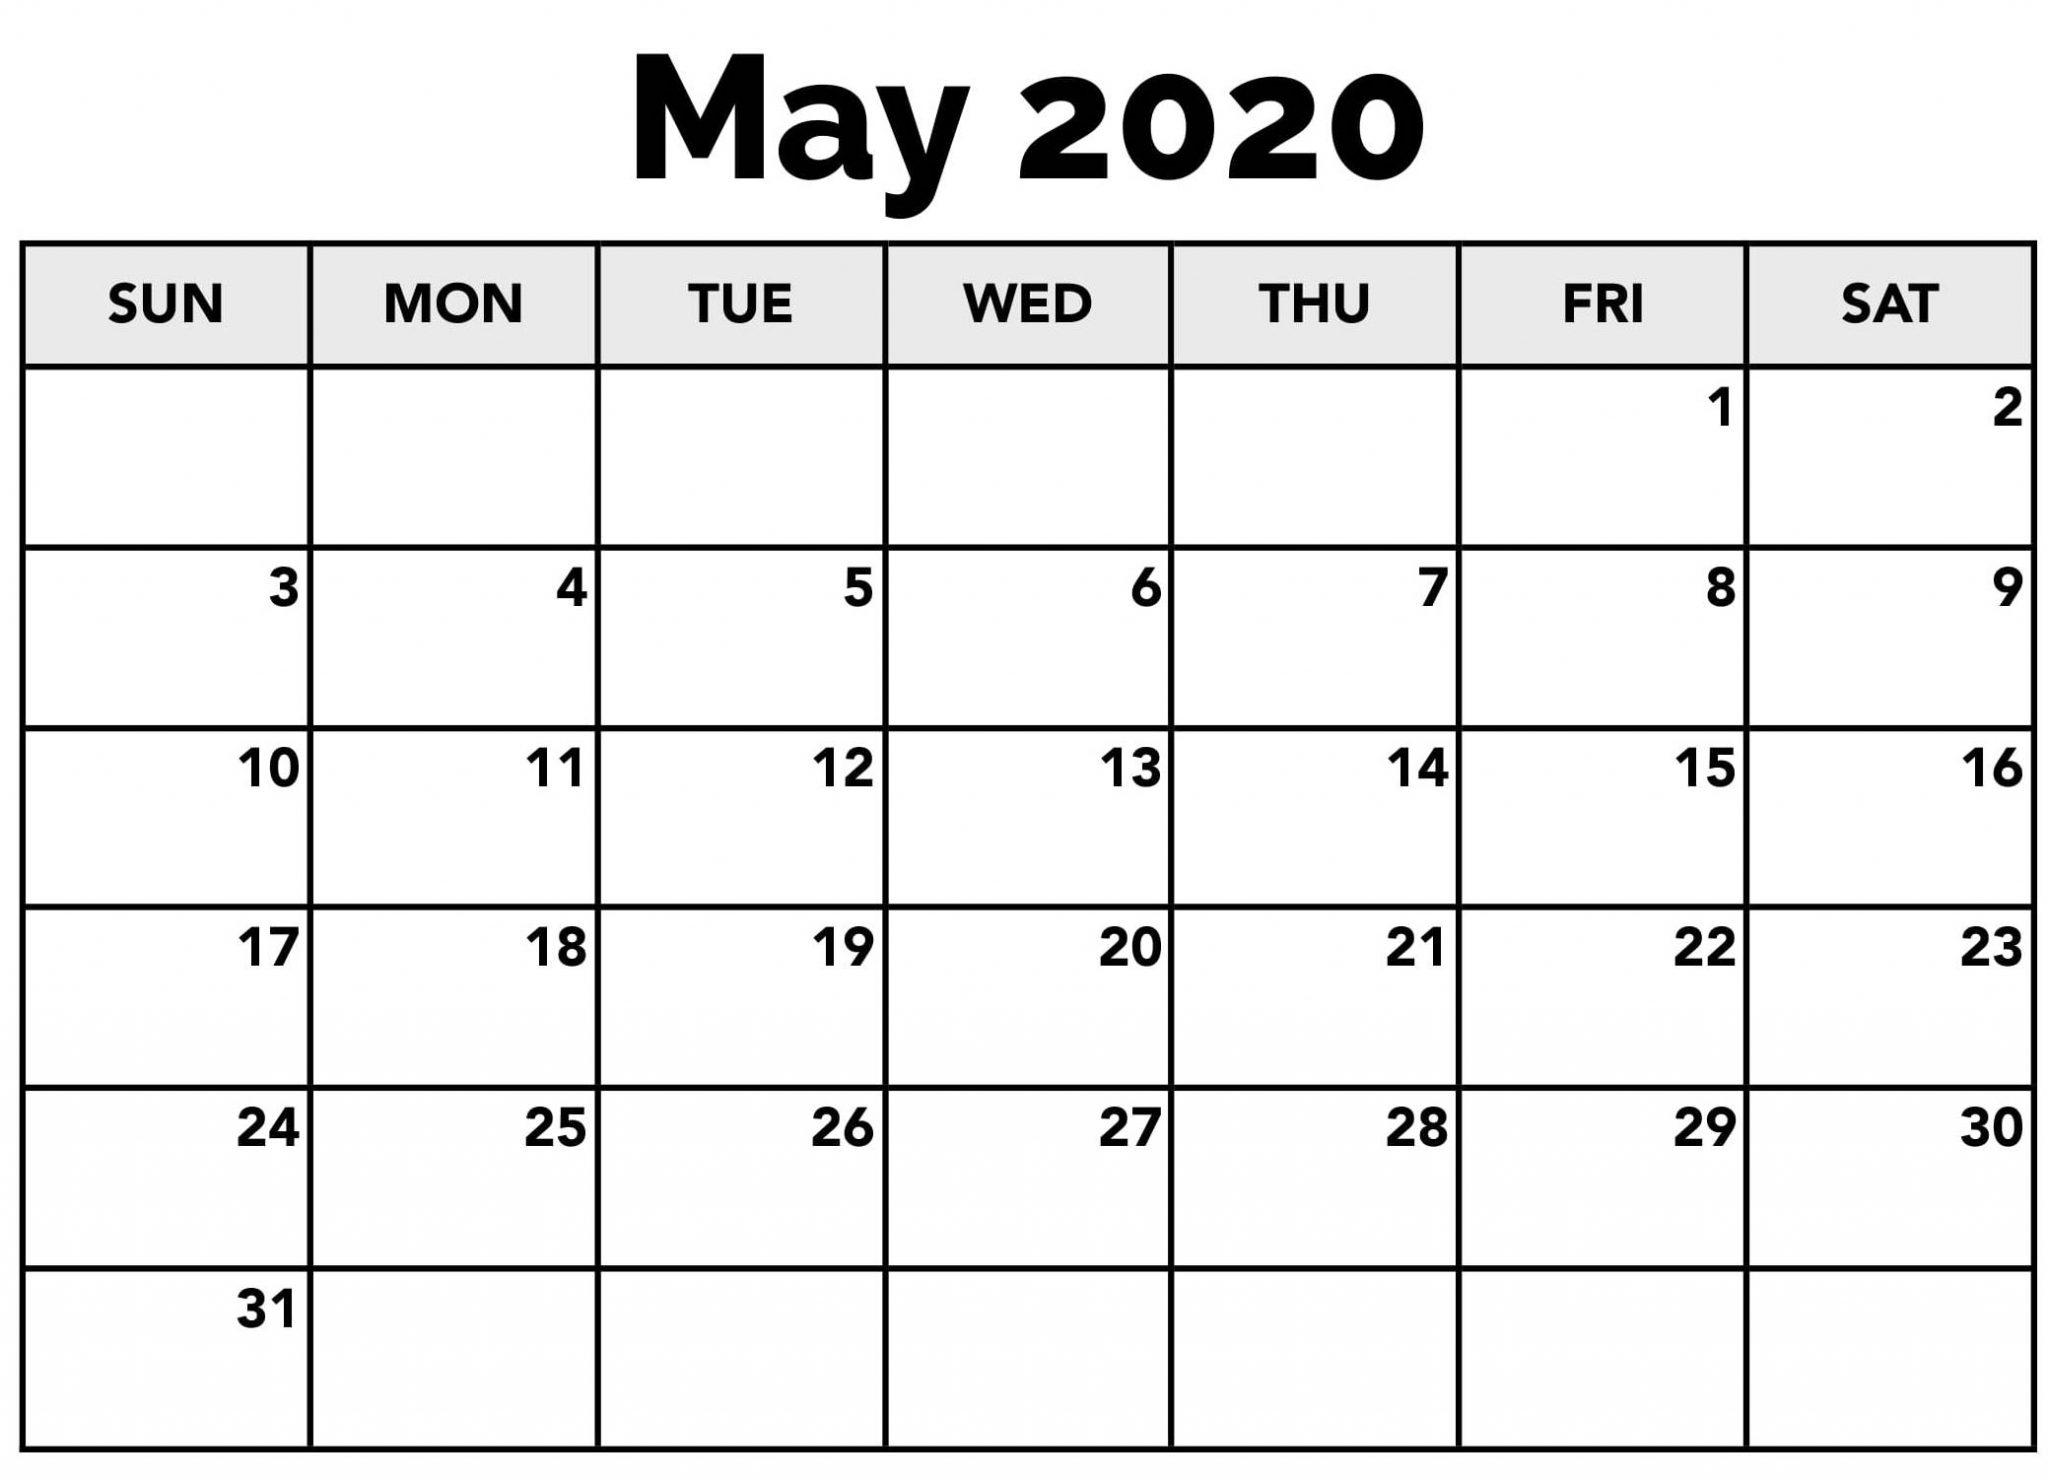 May 2020 USA Calendar